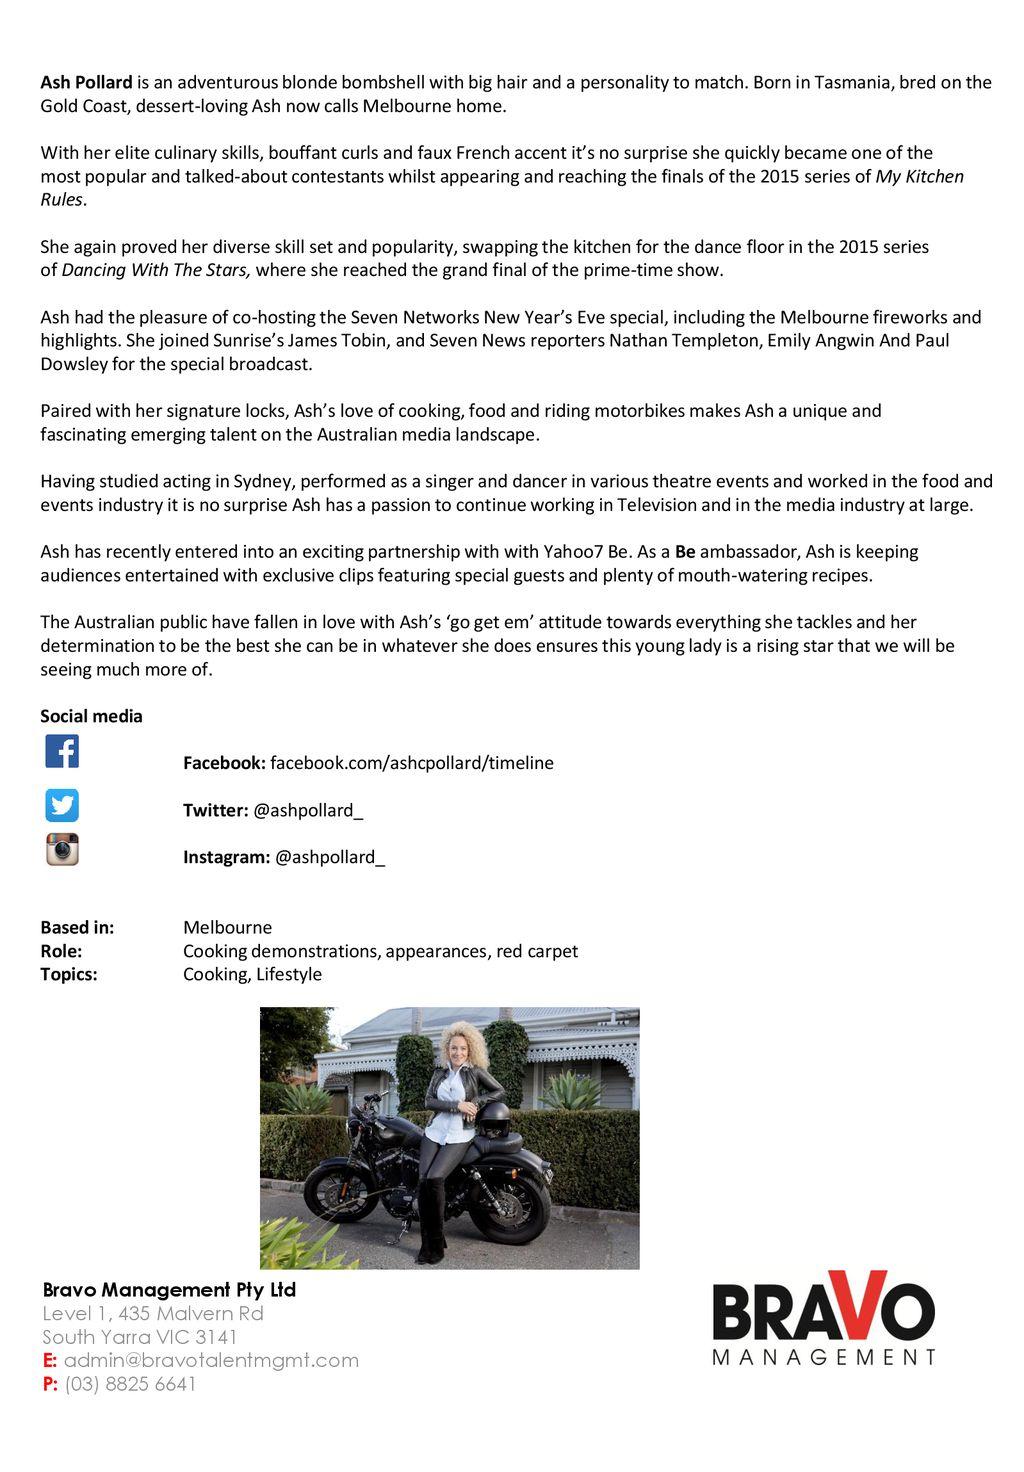 Ash Pollard Bravo Management Pty Ltd Level 1, 435 Malvern Rd